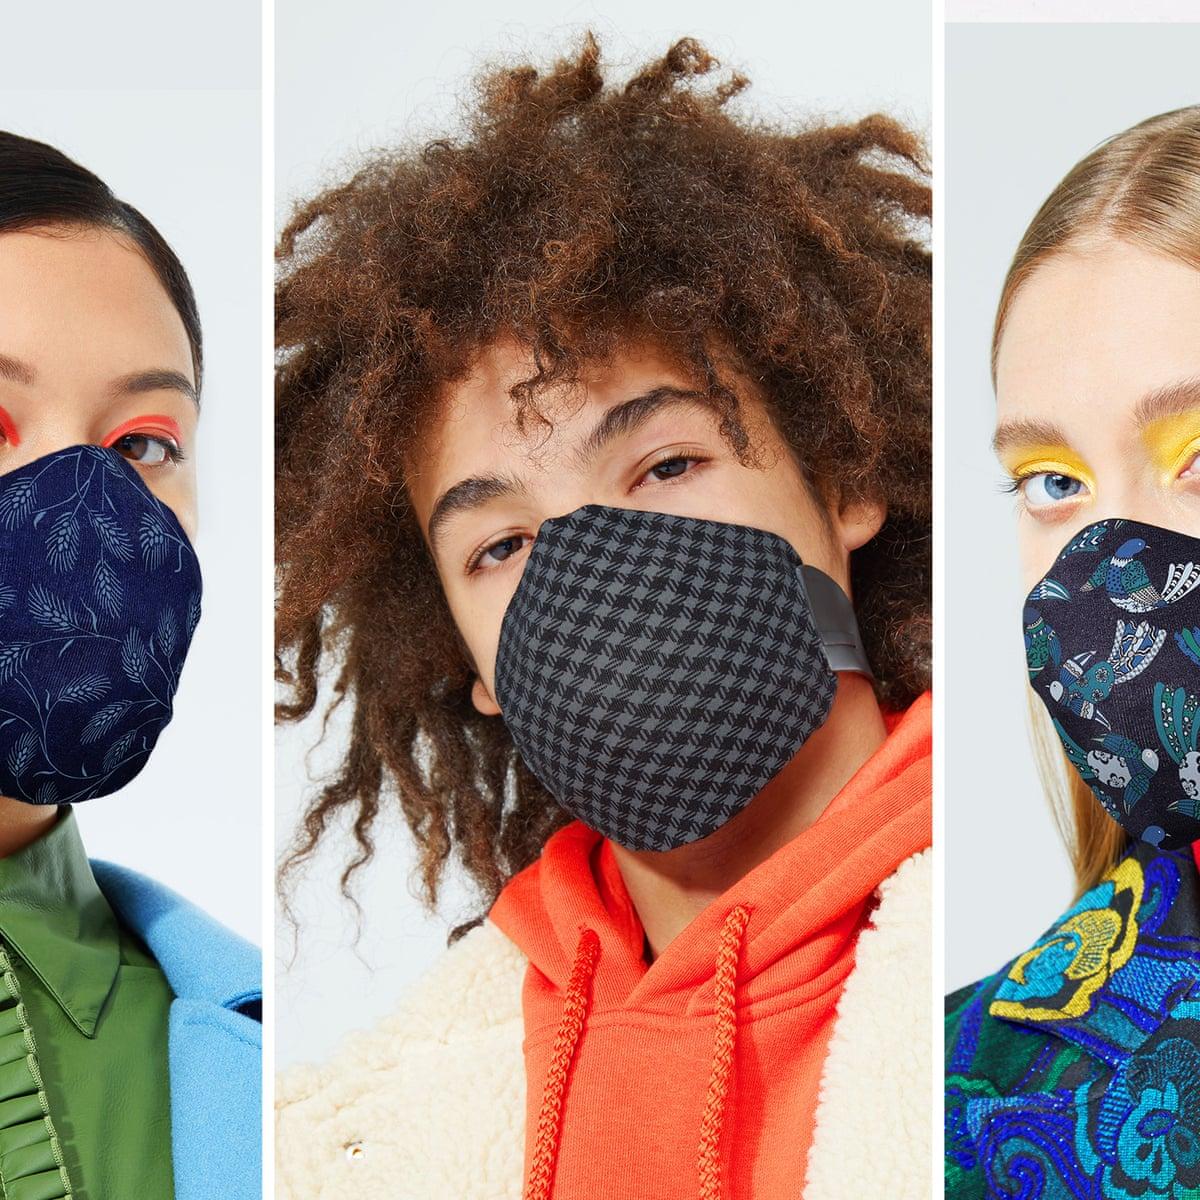 Fashionable Face Masks Trying To Make Something Horrific Seem Appealing Fashion The Guardian